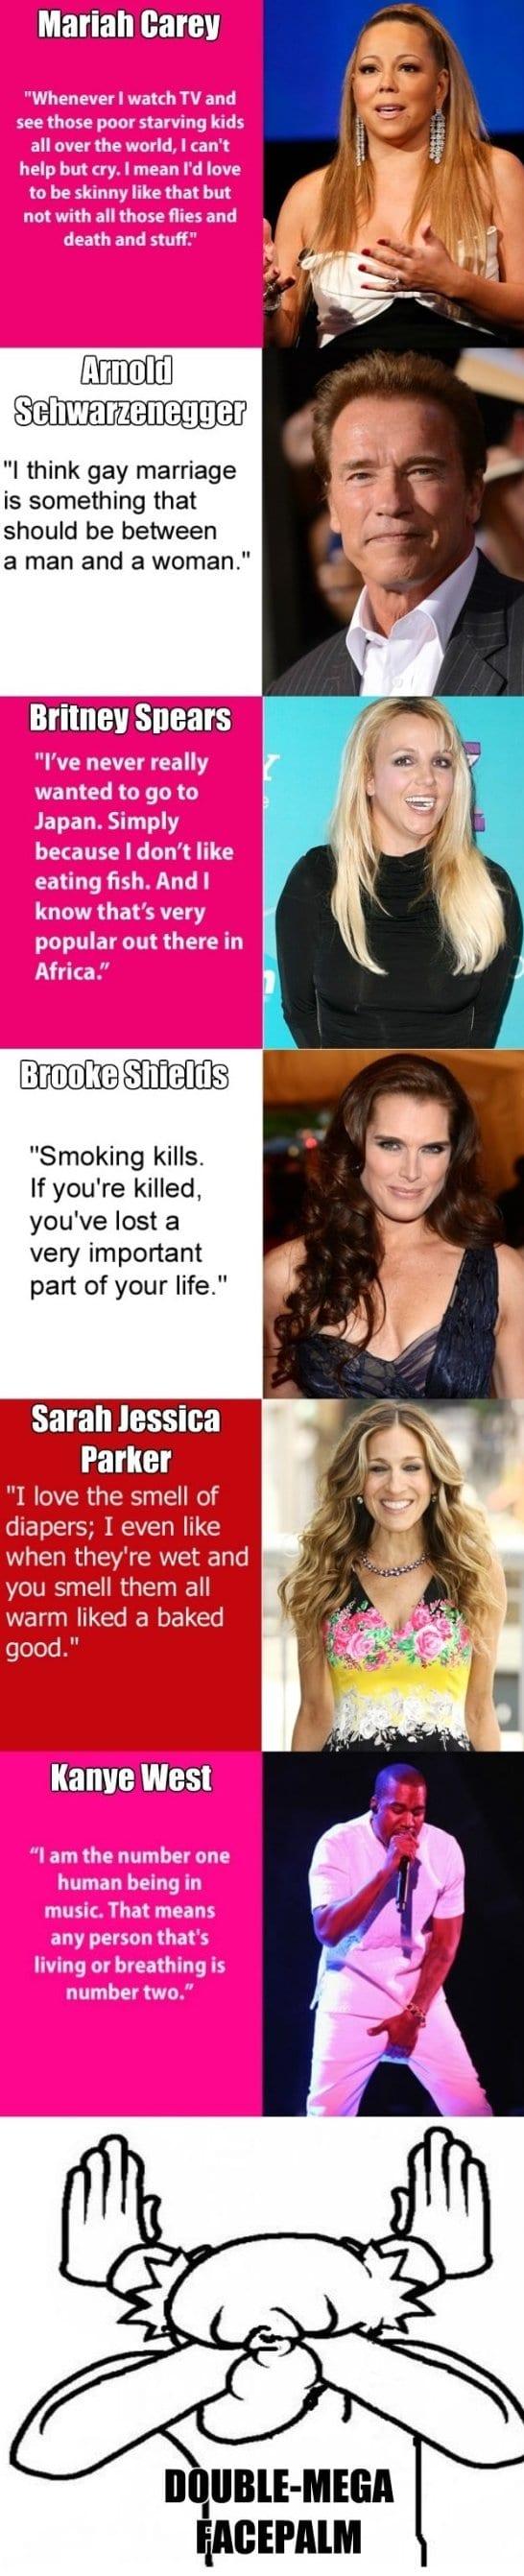 best-joke-2014-dumb-celebrity-quotes